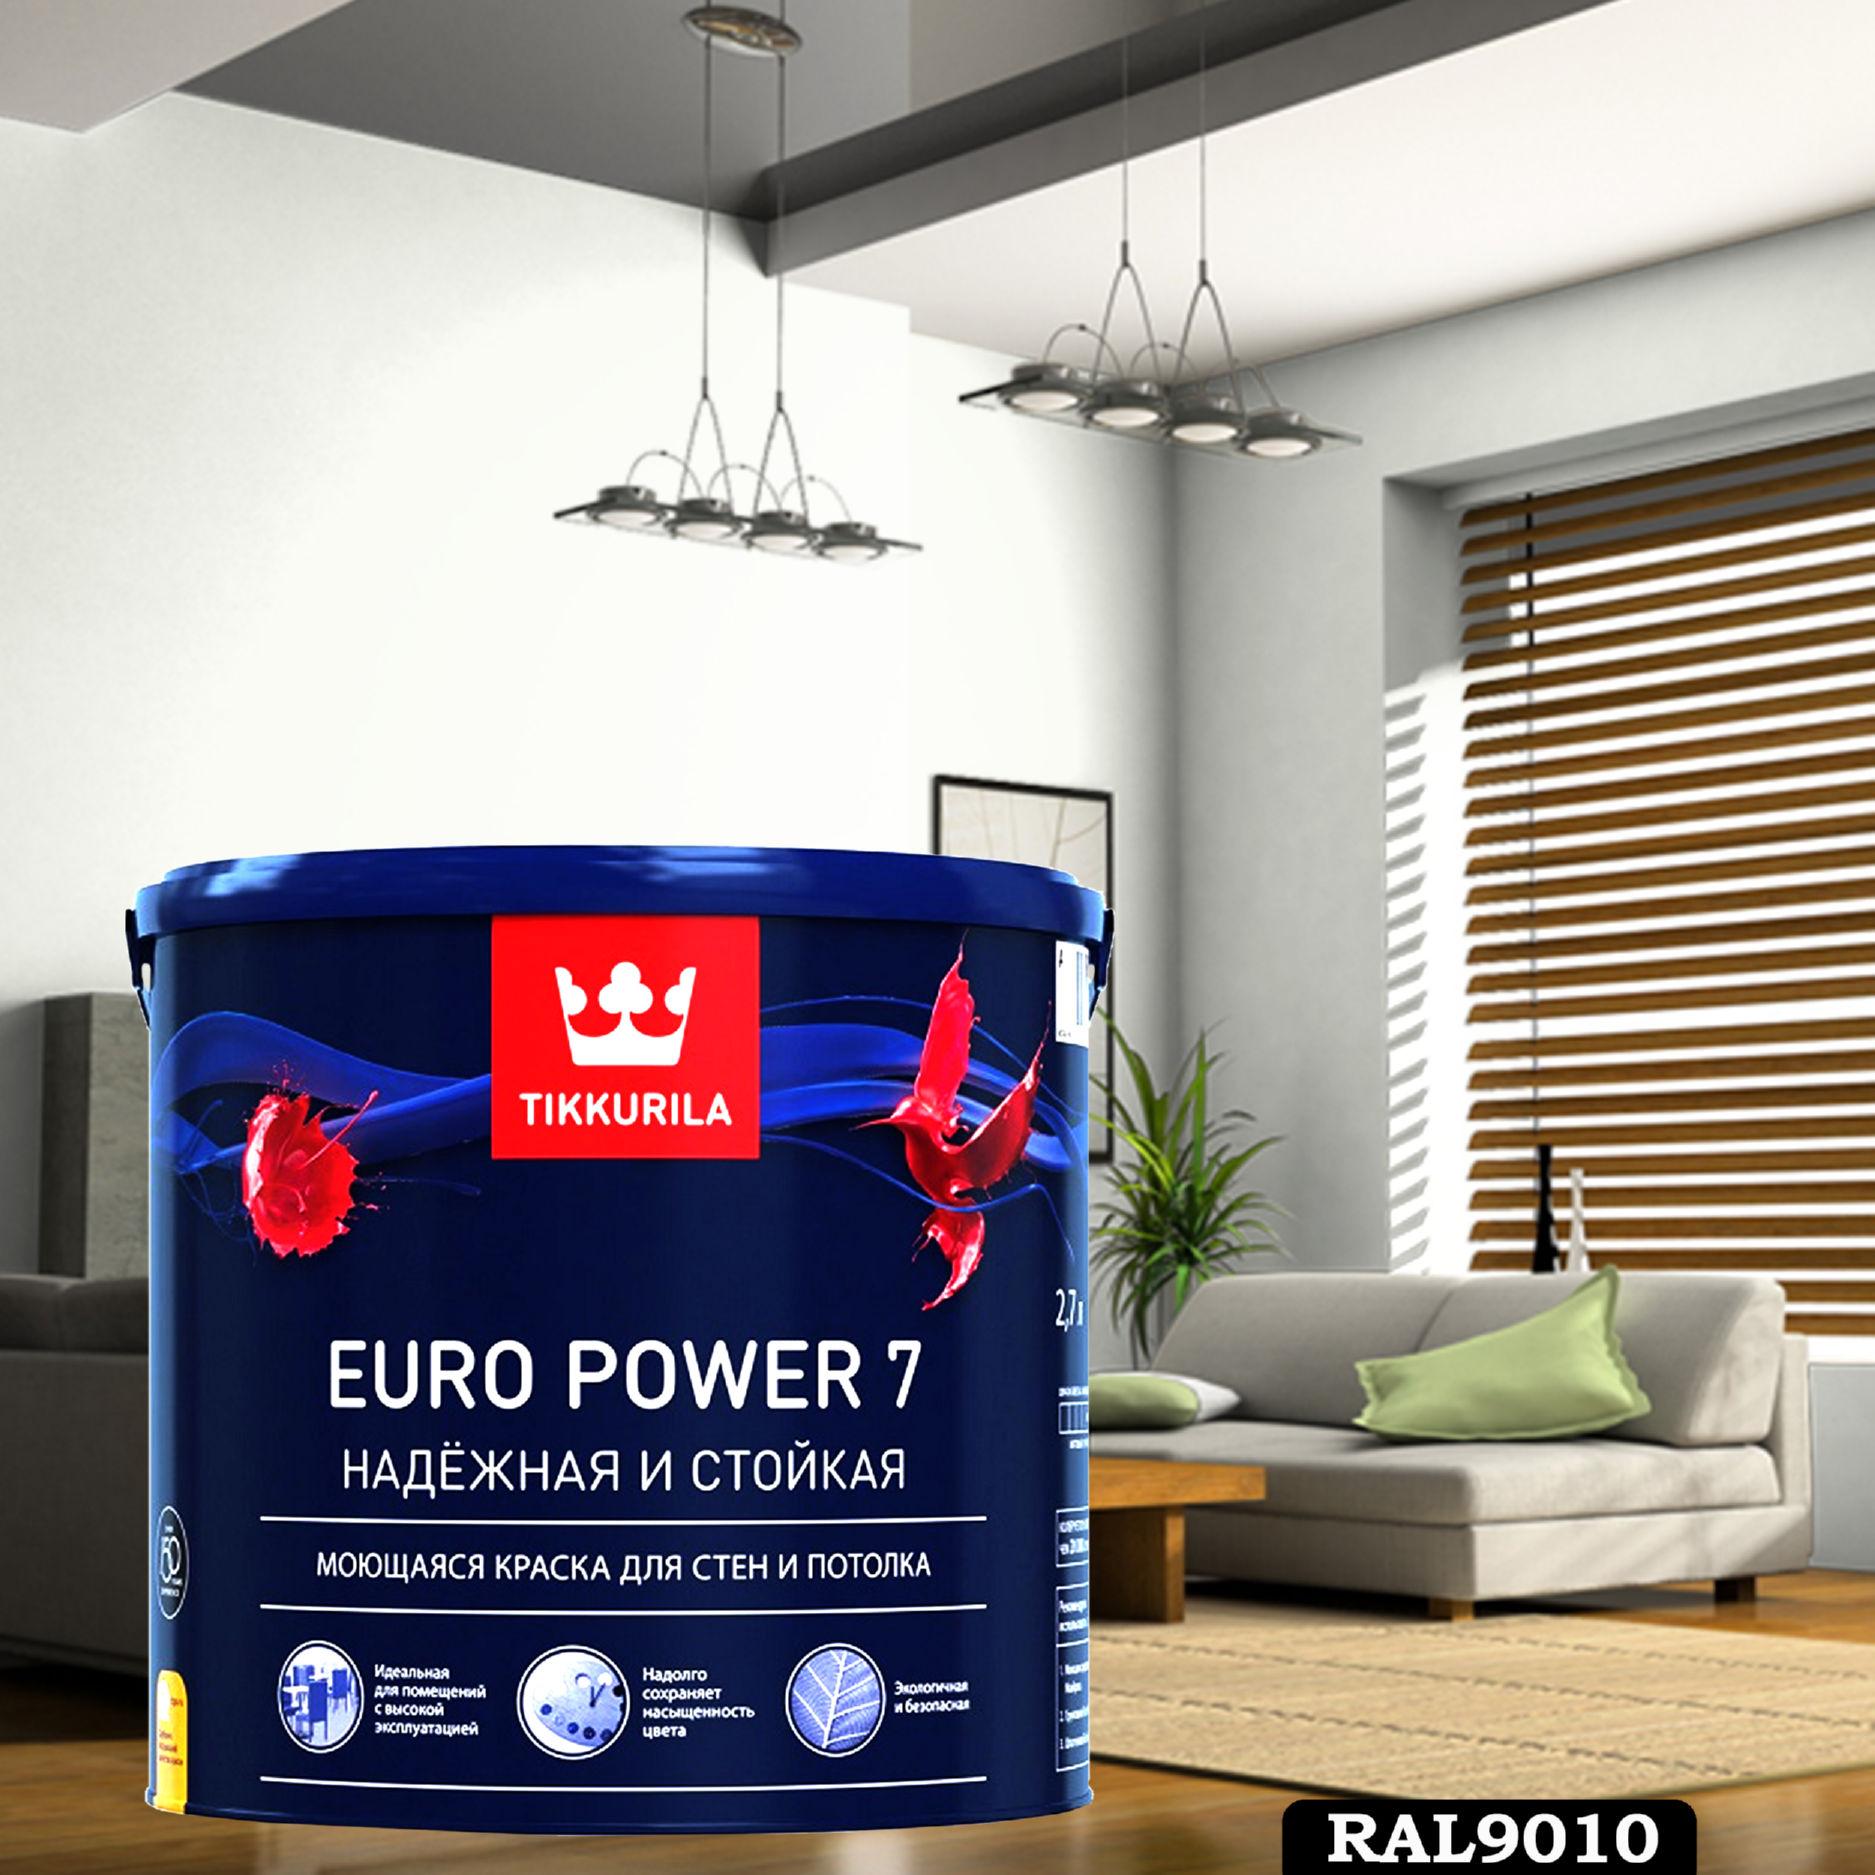 Фото 6 - Краска TIKKURILA Euro Power 7,  RAL 9010 Белый, латексная моющаяся матовая интерьерная, 9 л.